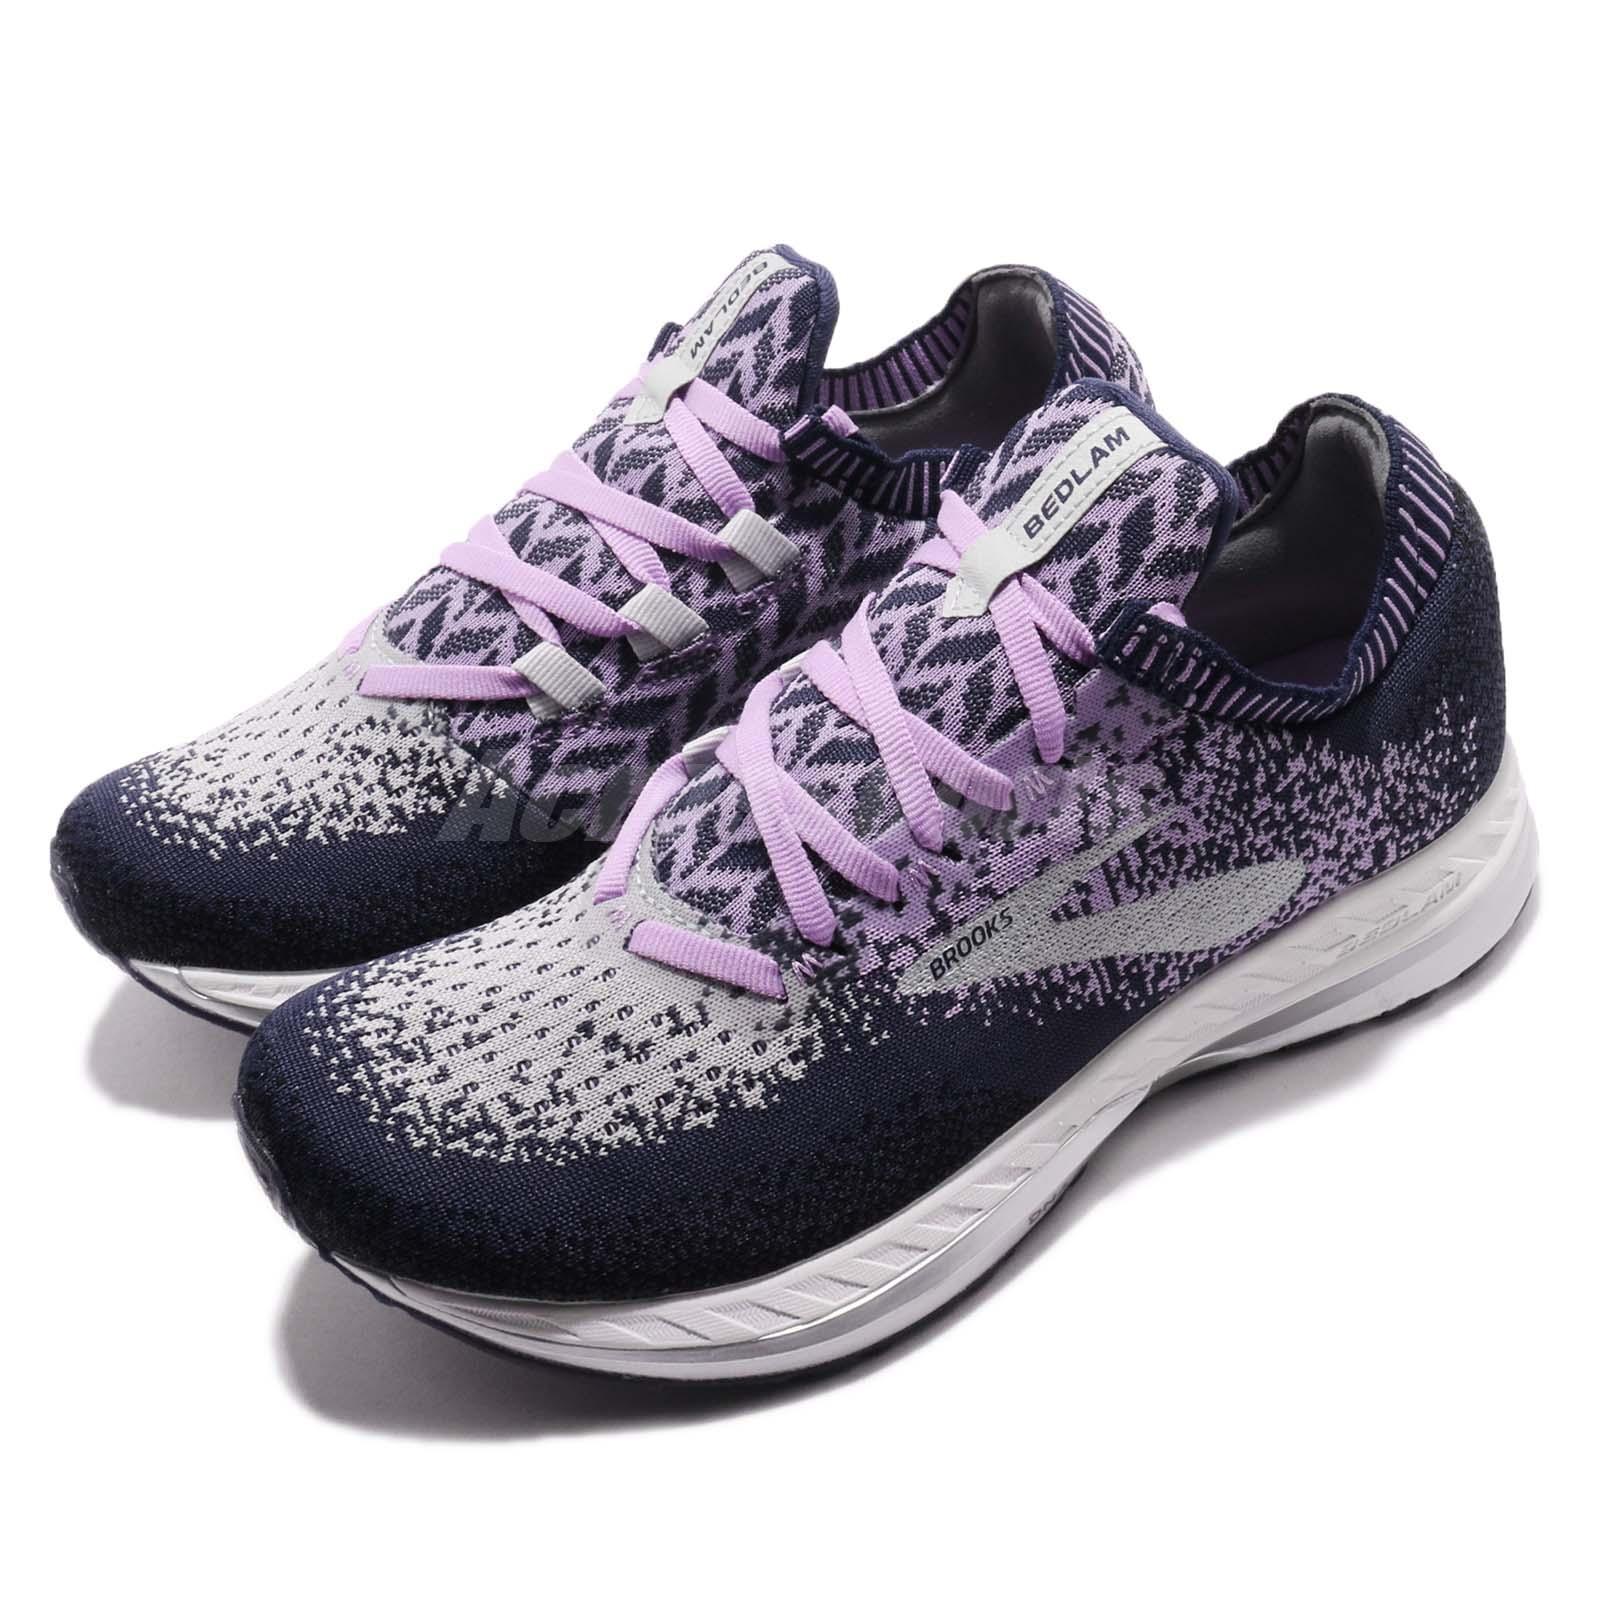 63d728a7fef77 Brooks Bedlam Purple Navy Grey Women Running Training Shoes Sneakers ...